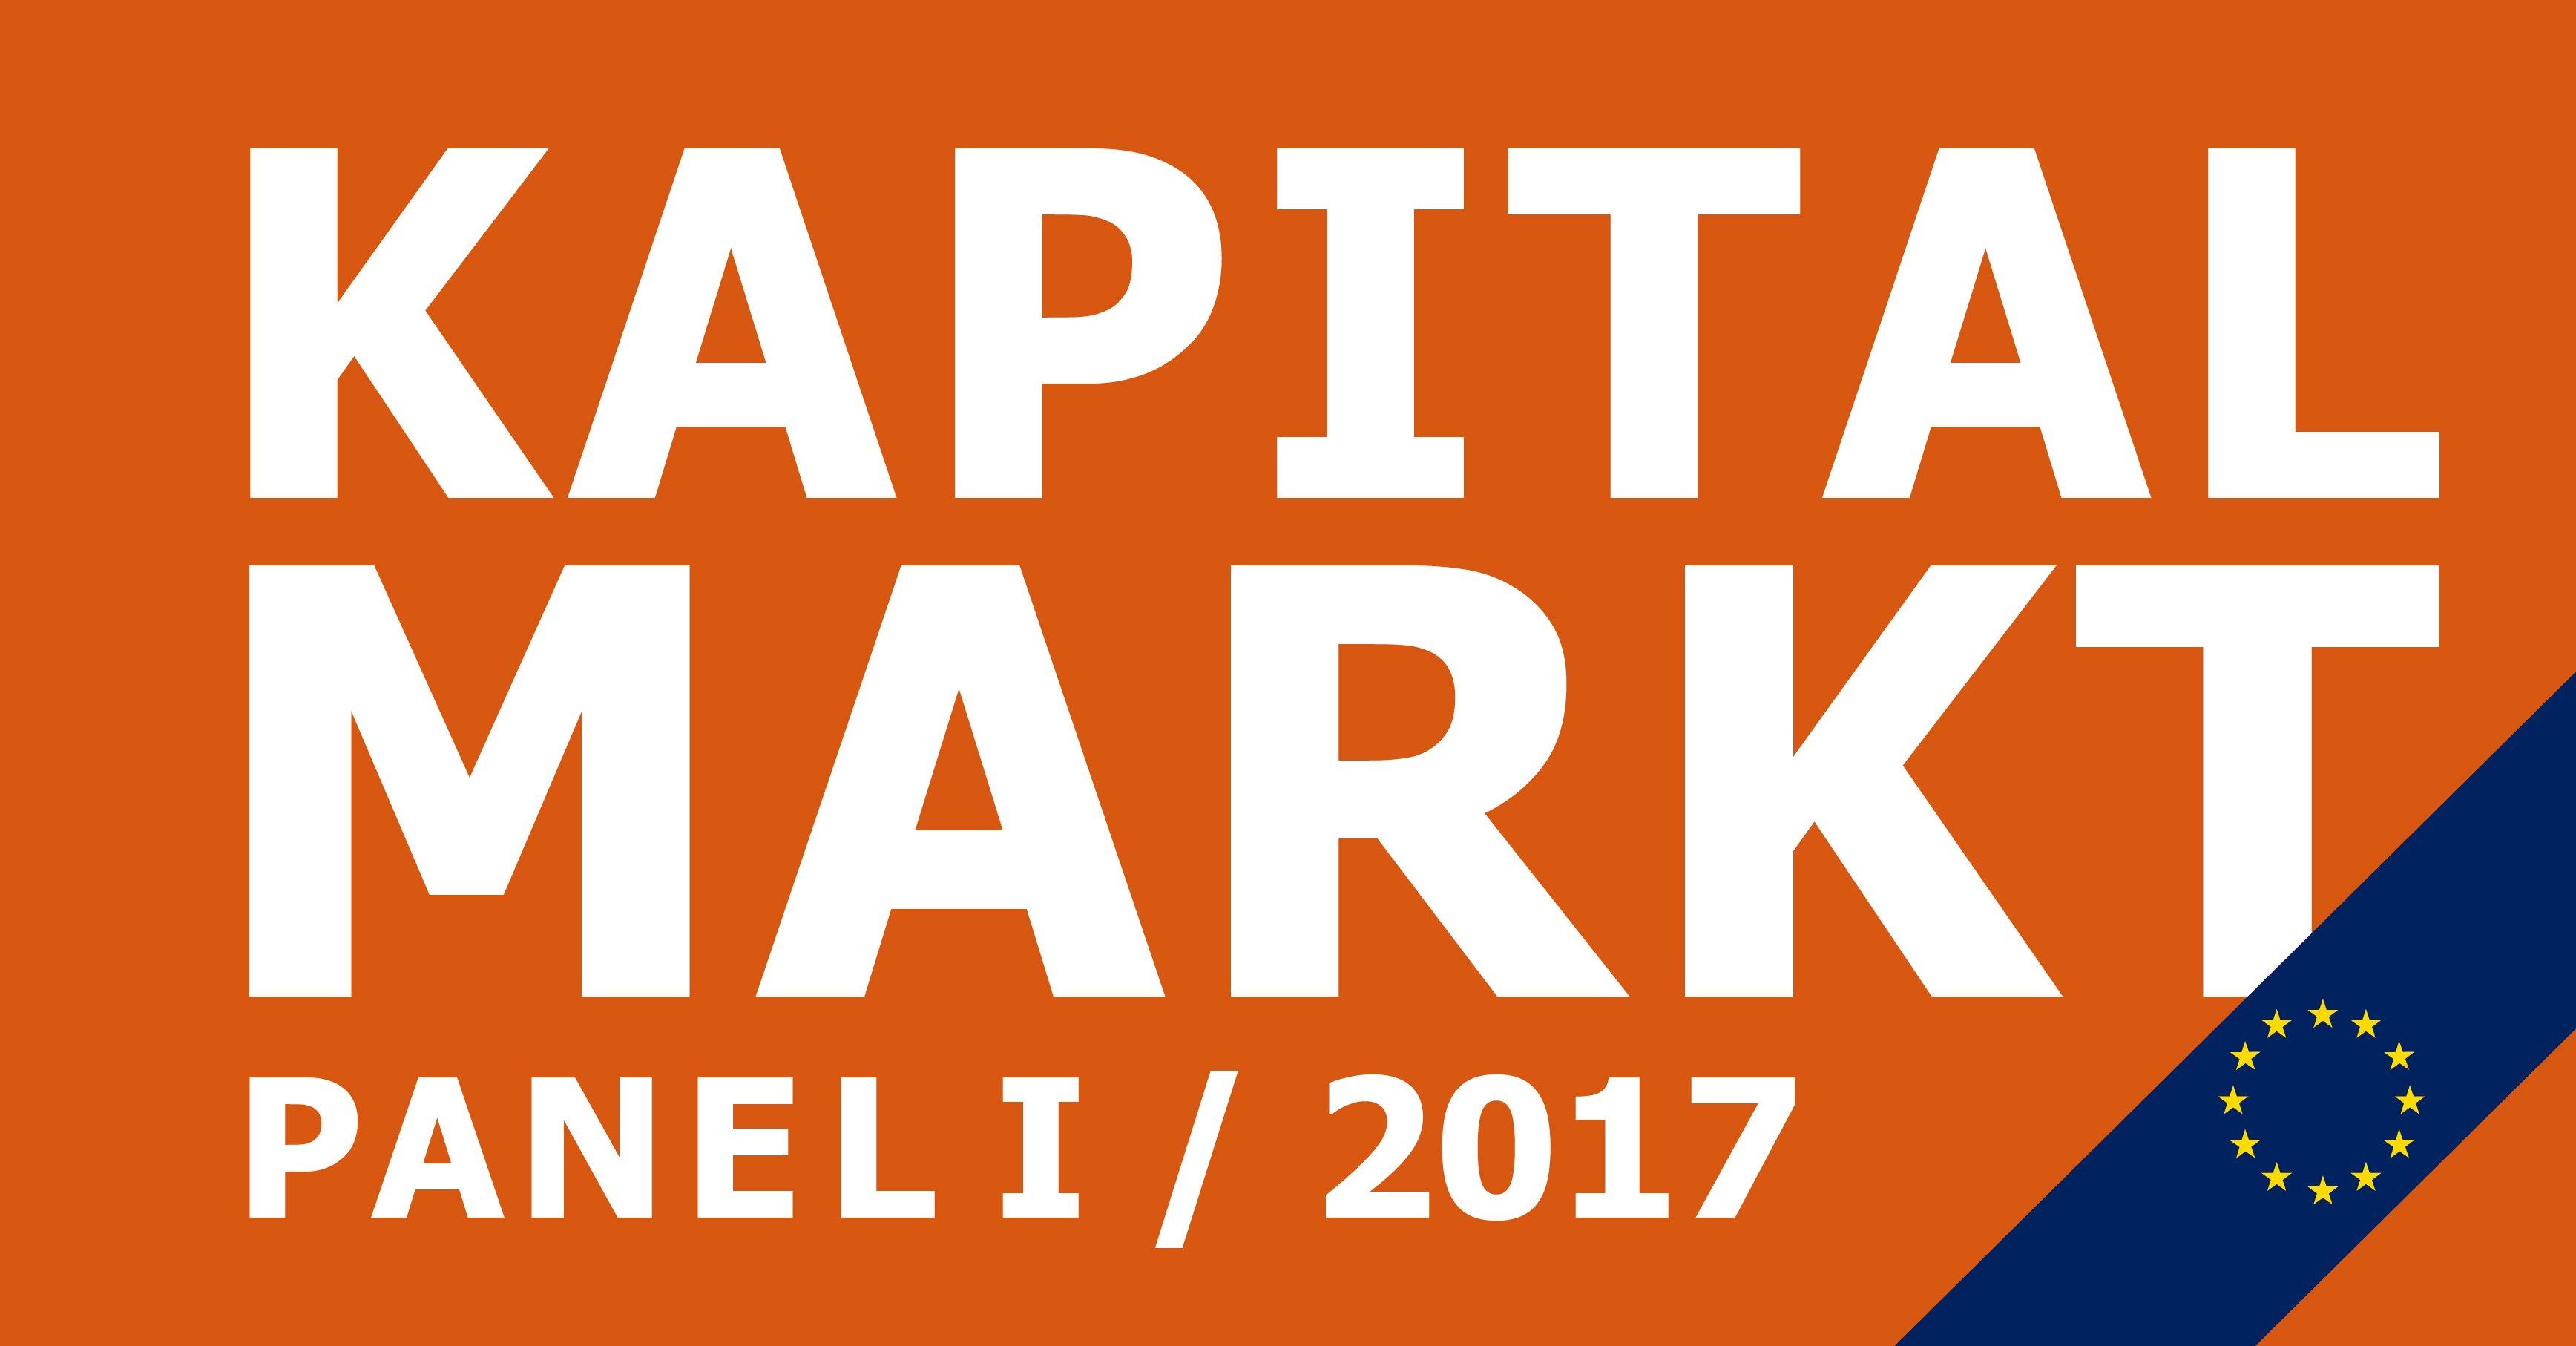 cometis AG Europäisches Kapitalmarktpanel I 2017